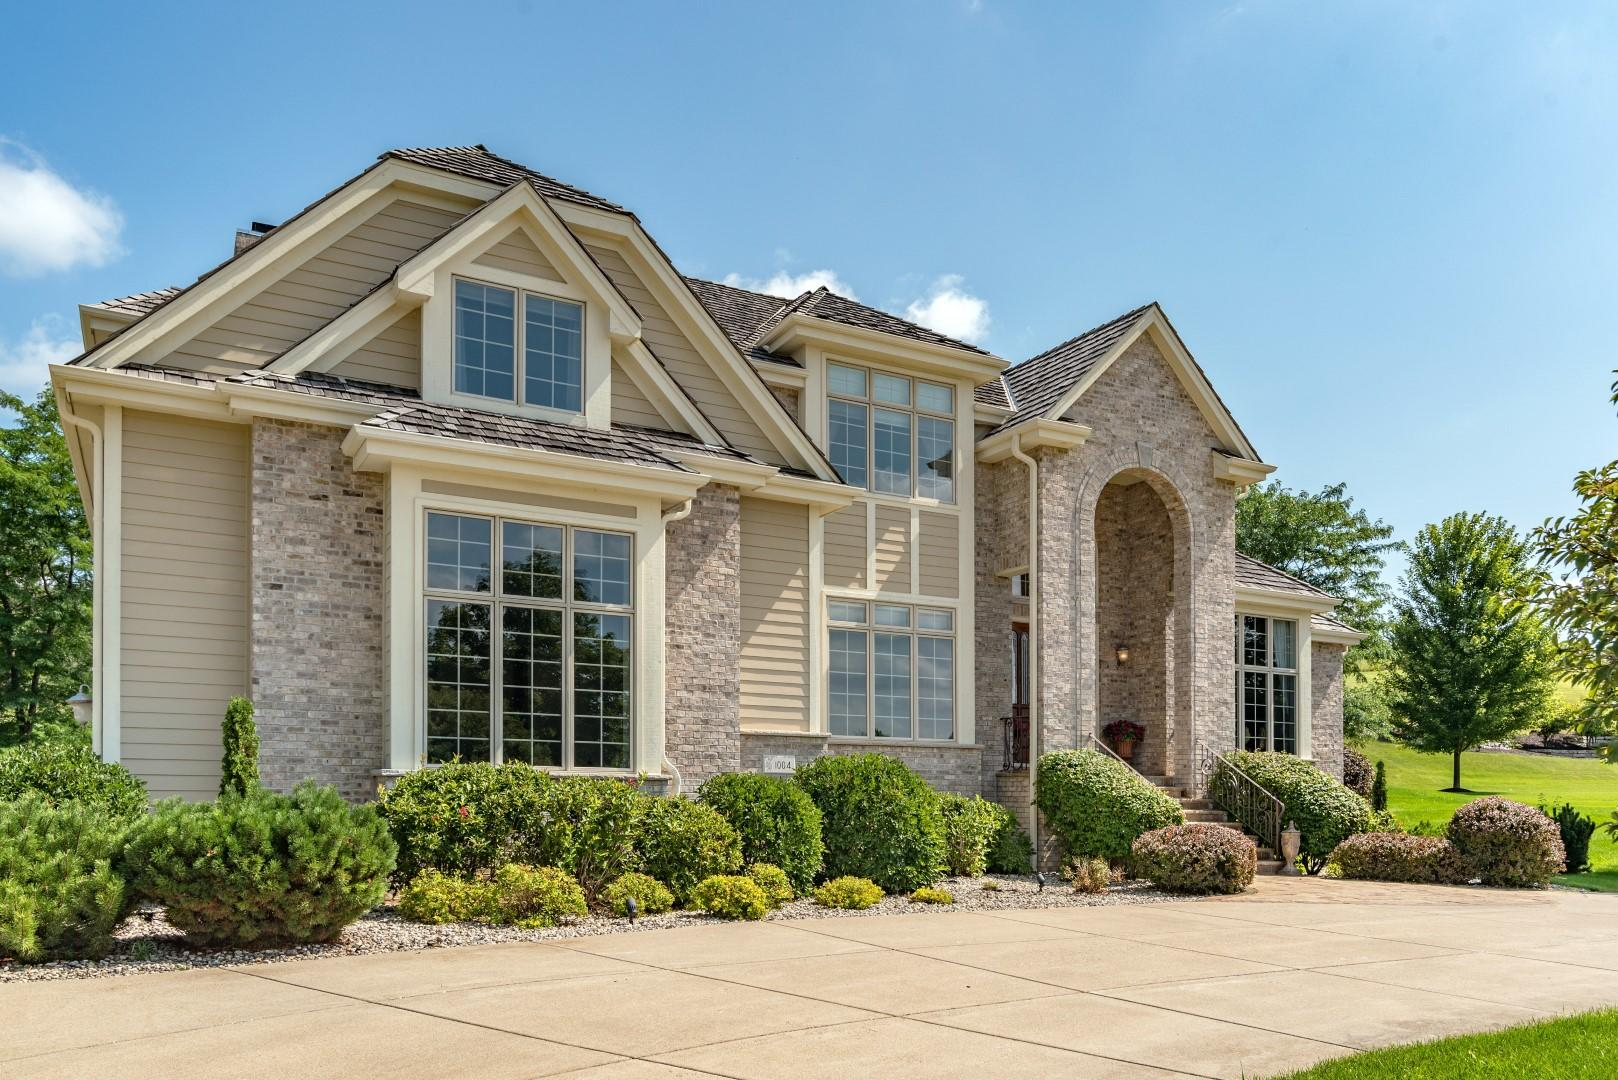 1004 Cypress Ct, Hartland, Wisconsin 53029, 4 Bedrooms Bedrooms, 10 Rooms Rooms,4 BathroomsBathrooms,Single-Family,For Sale,Cypress Ct,1598890